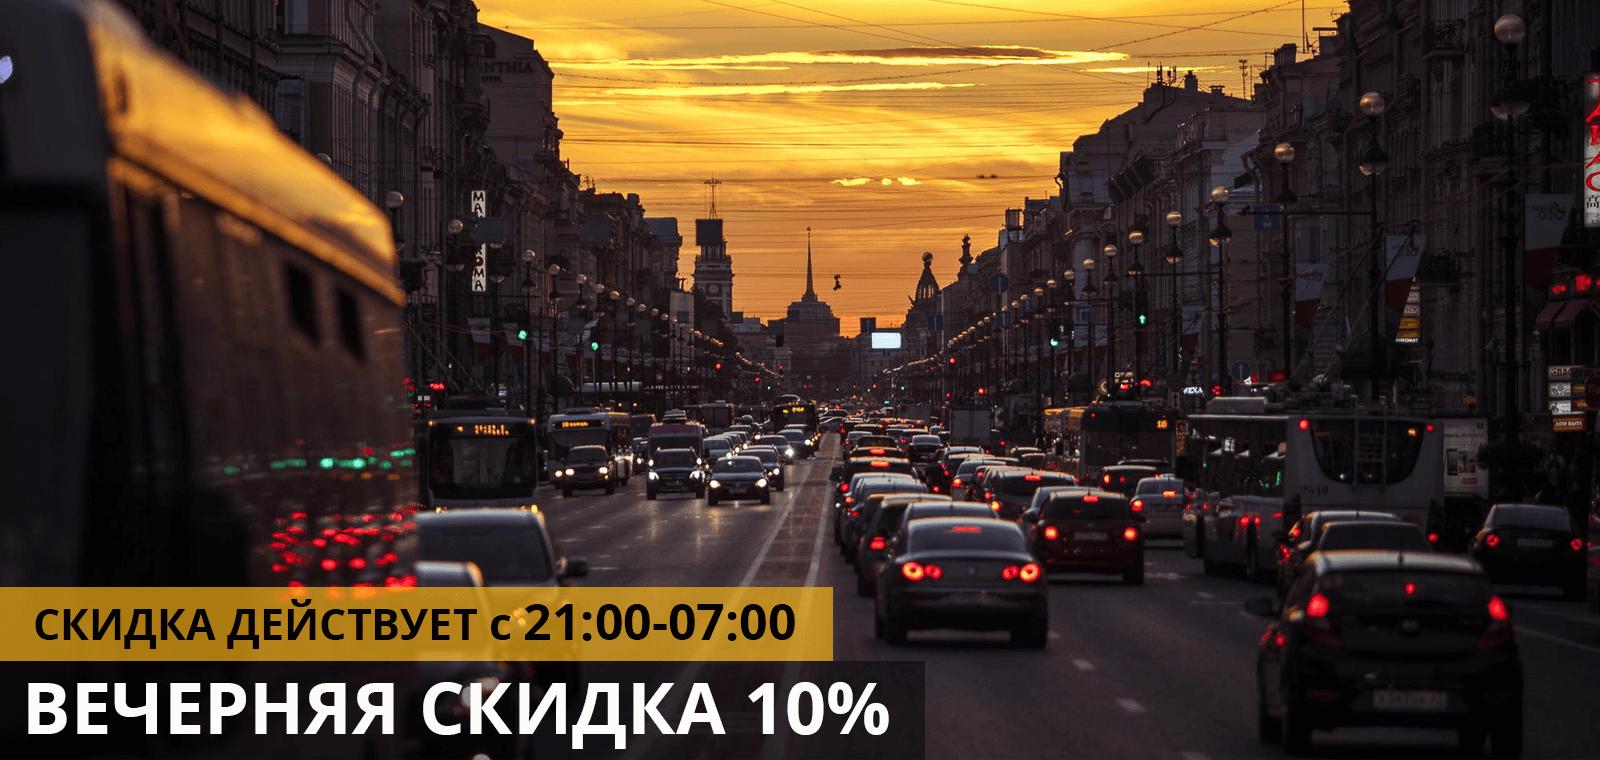 skidka vecher - Скидки